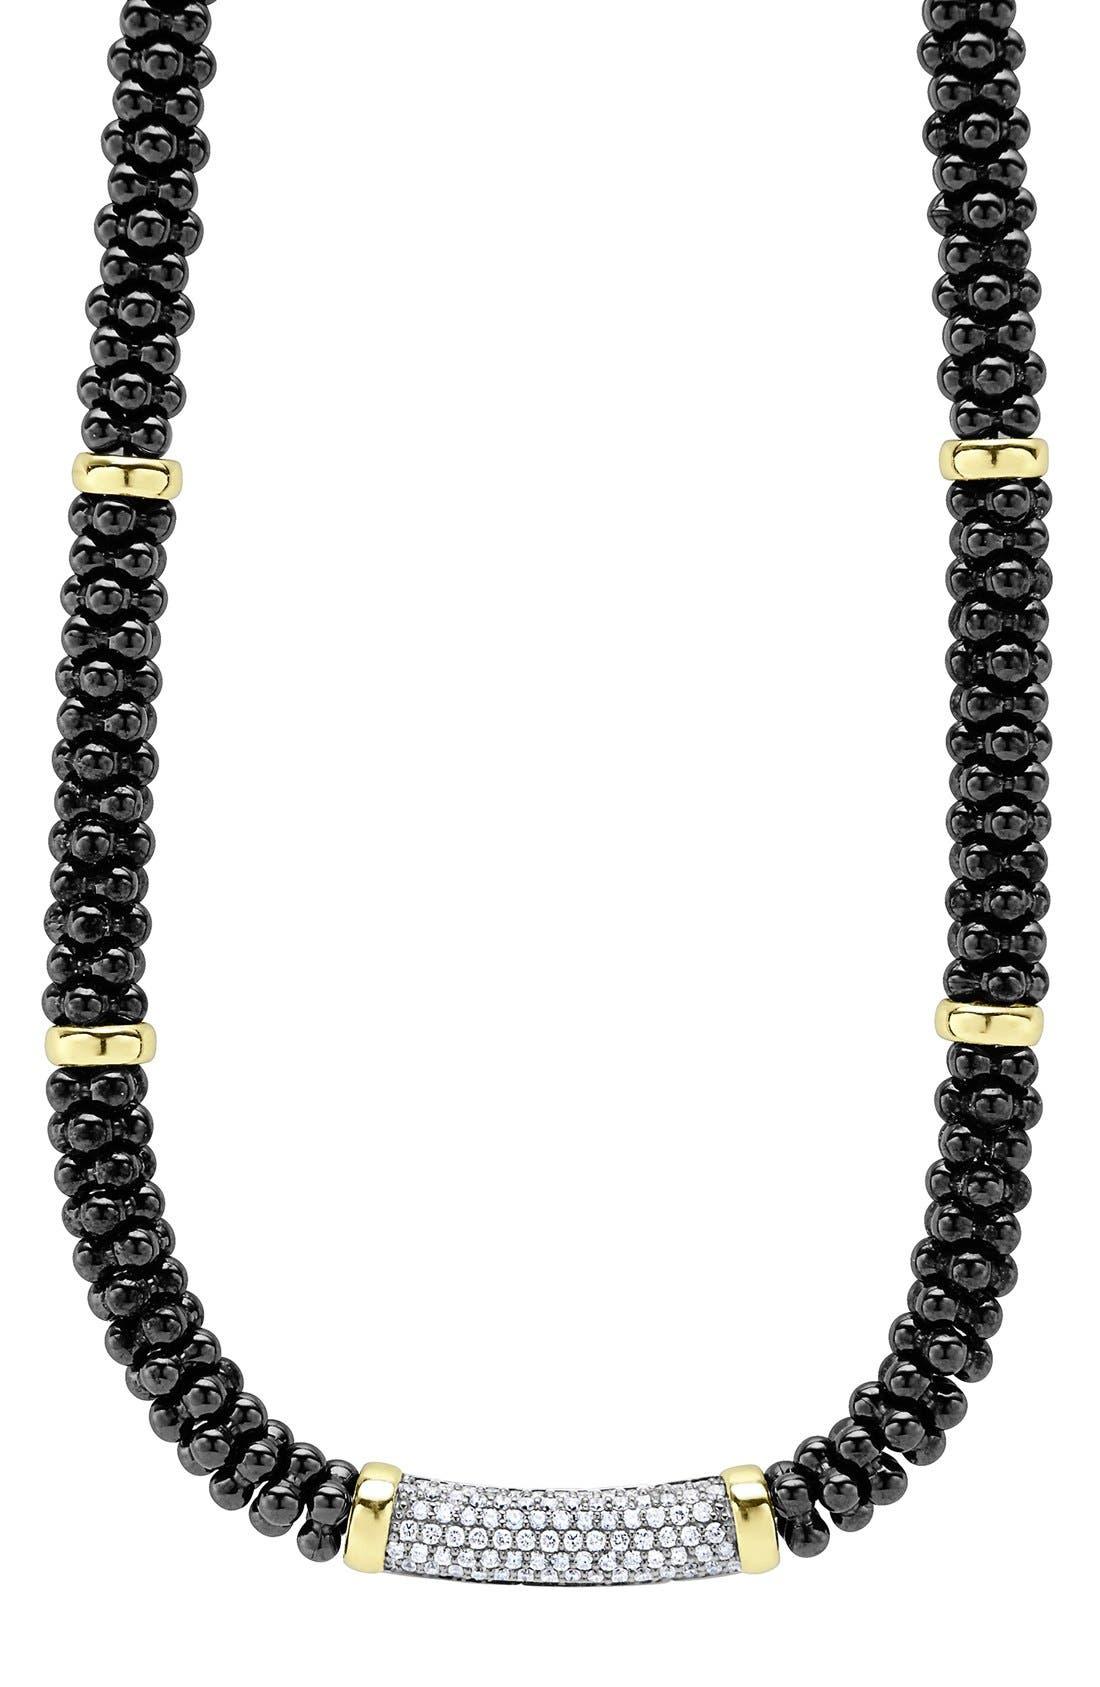 LAGOS 'Black Caviar' 7mm Beaded Diamond Bar Necklace, Main, color, 001